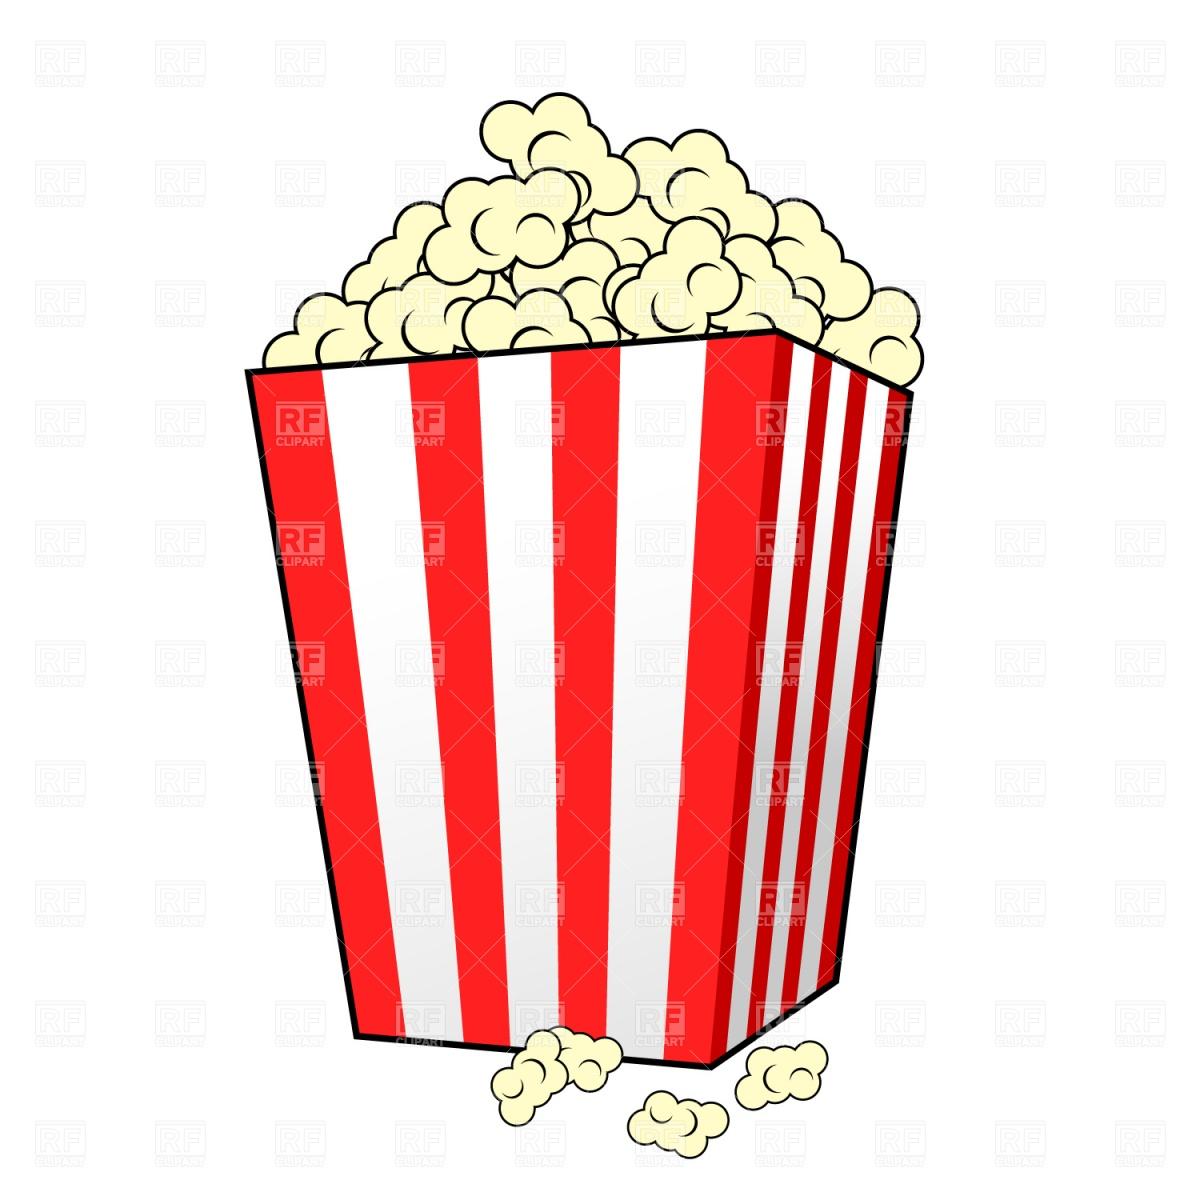 free popcorn clipart black and white - photo #24